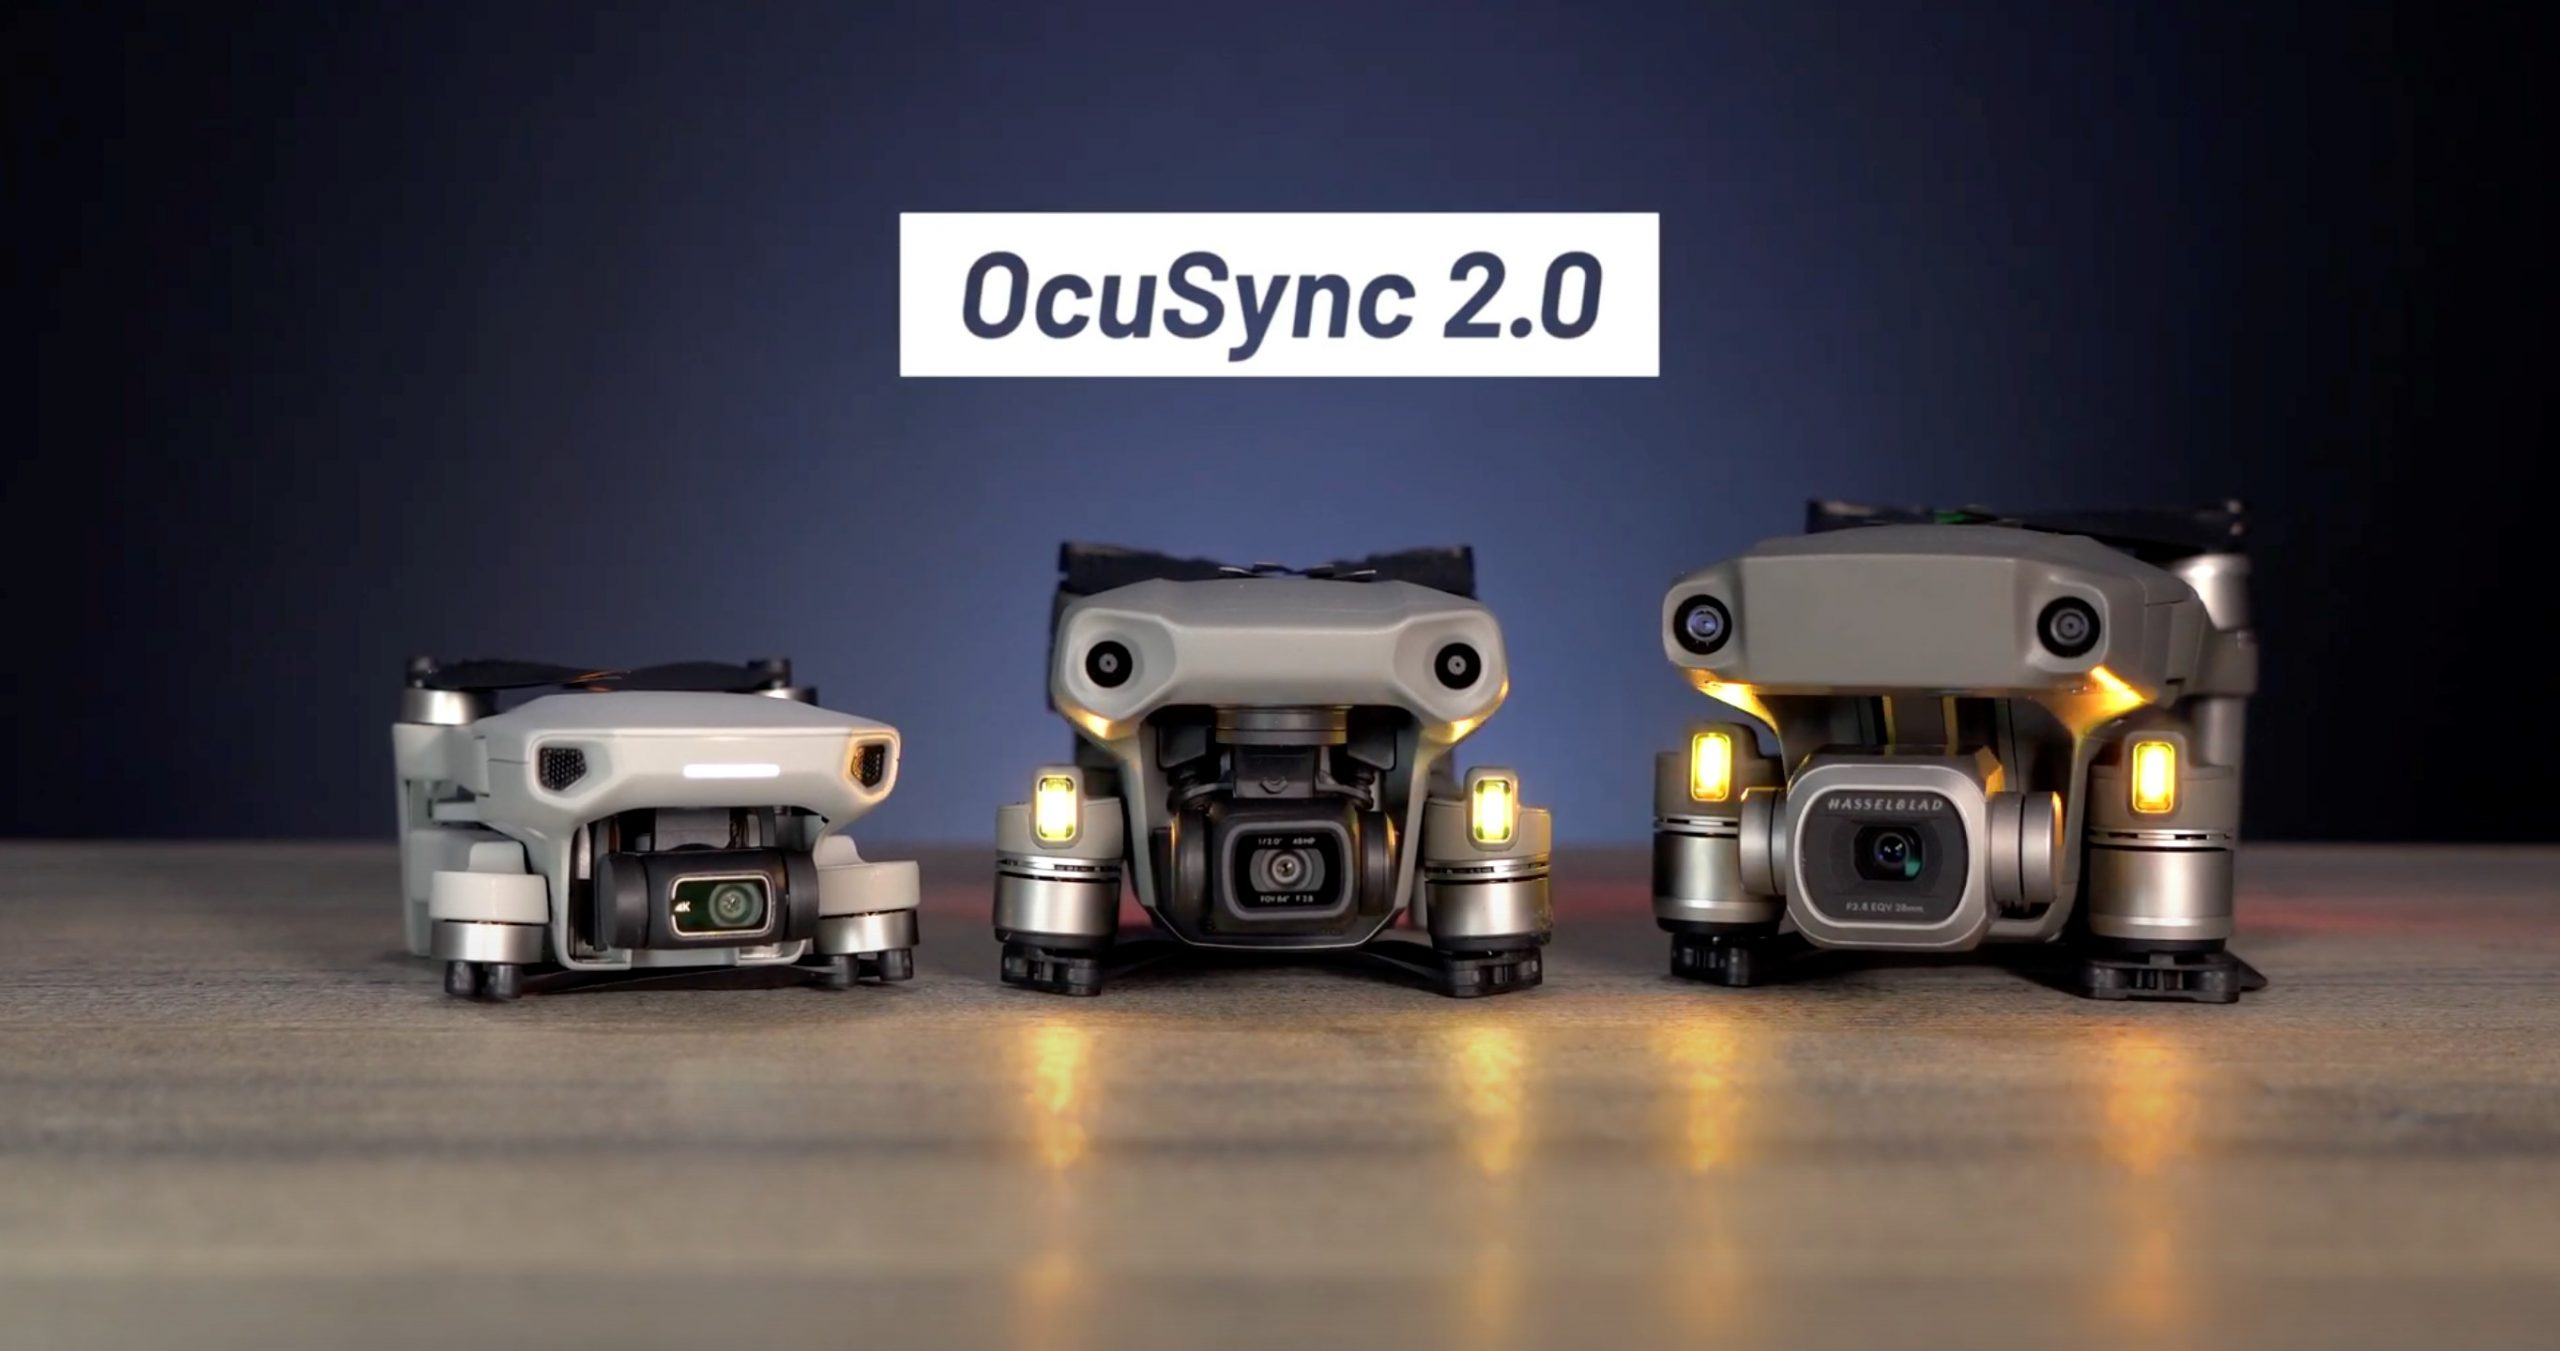 OcuSync 2.0